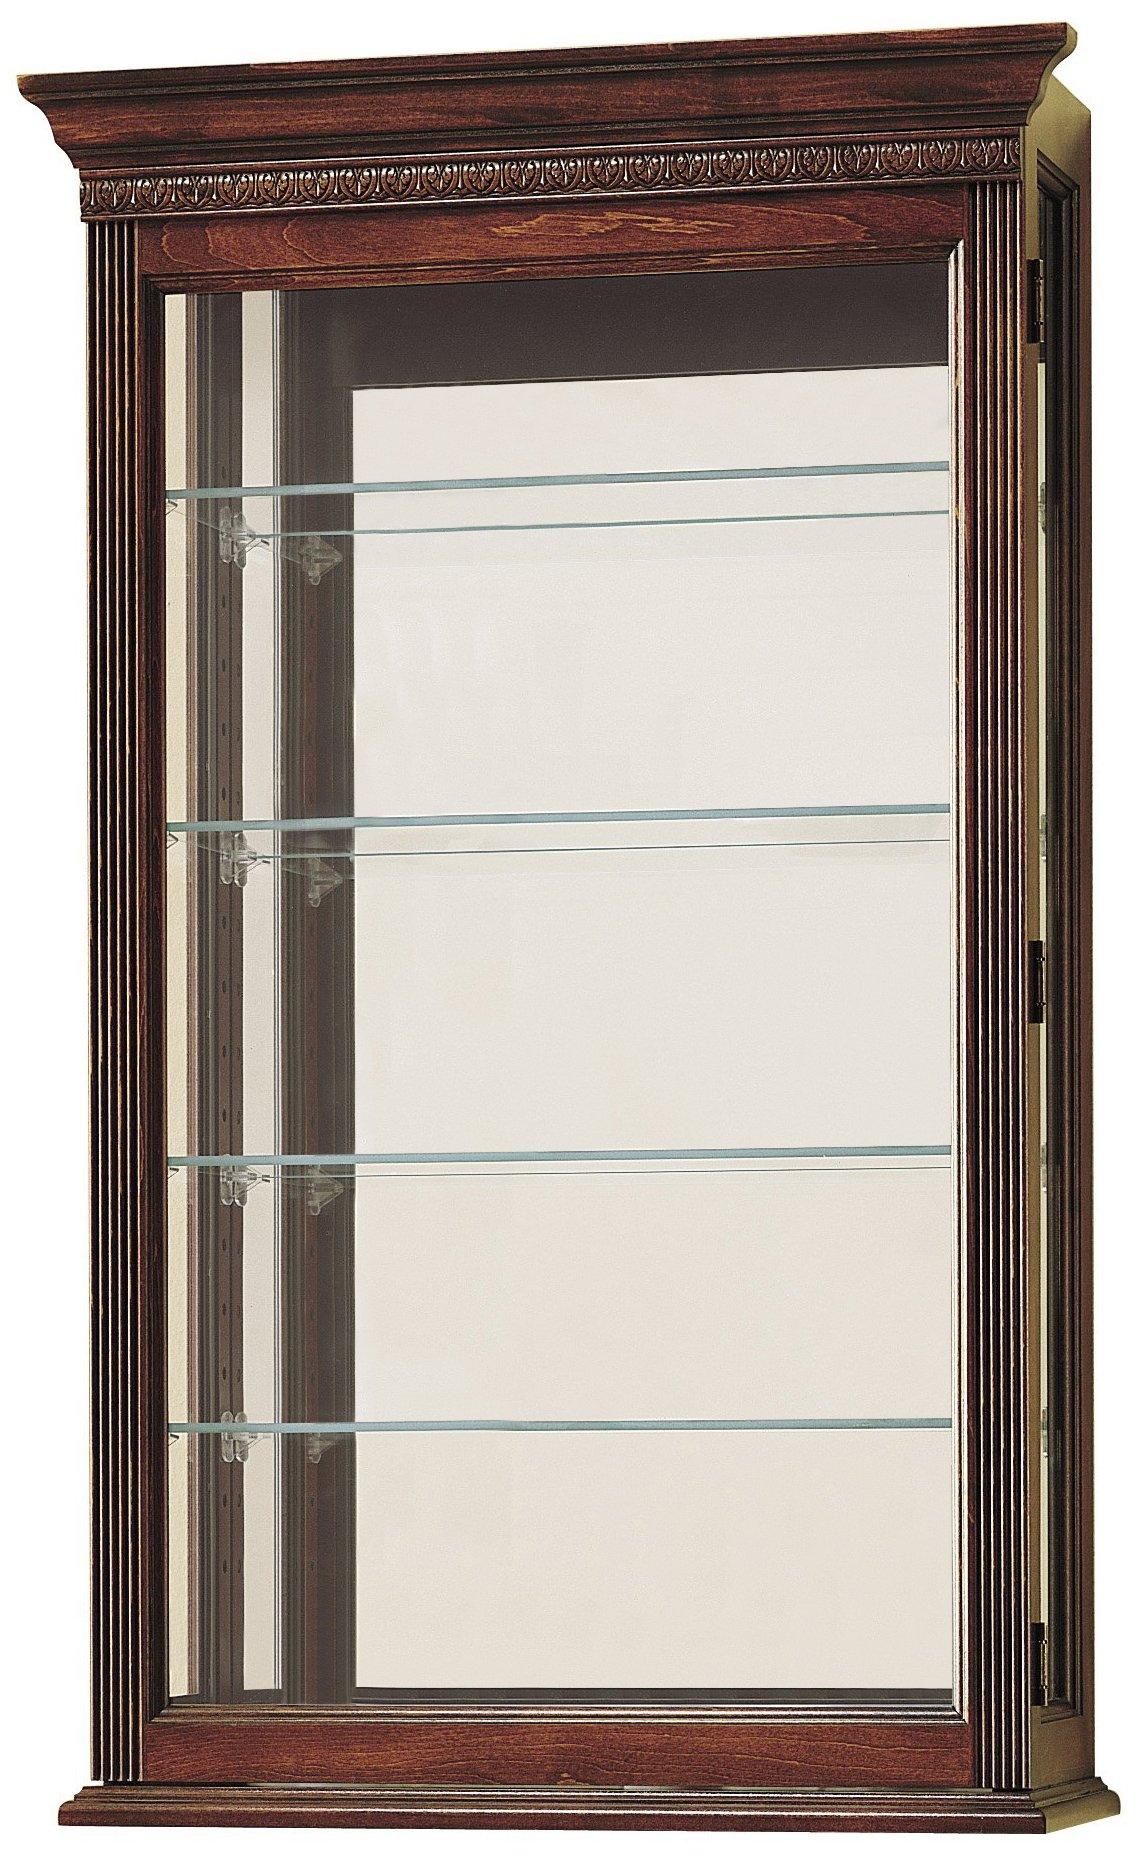 Howard Miller 685-104 Edmonton Curio Cabinet by